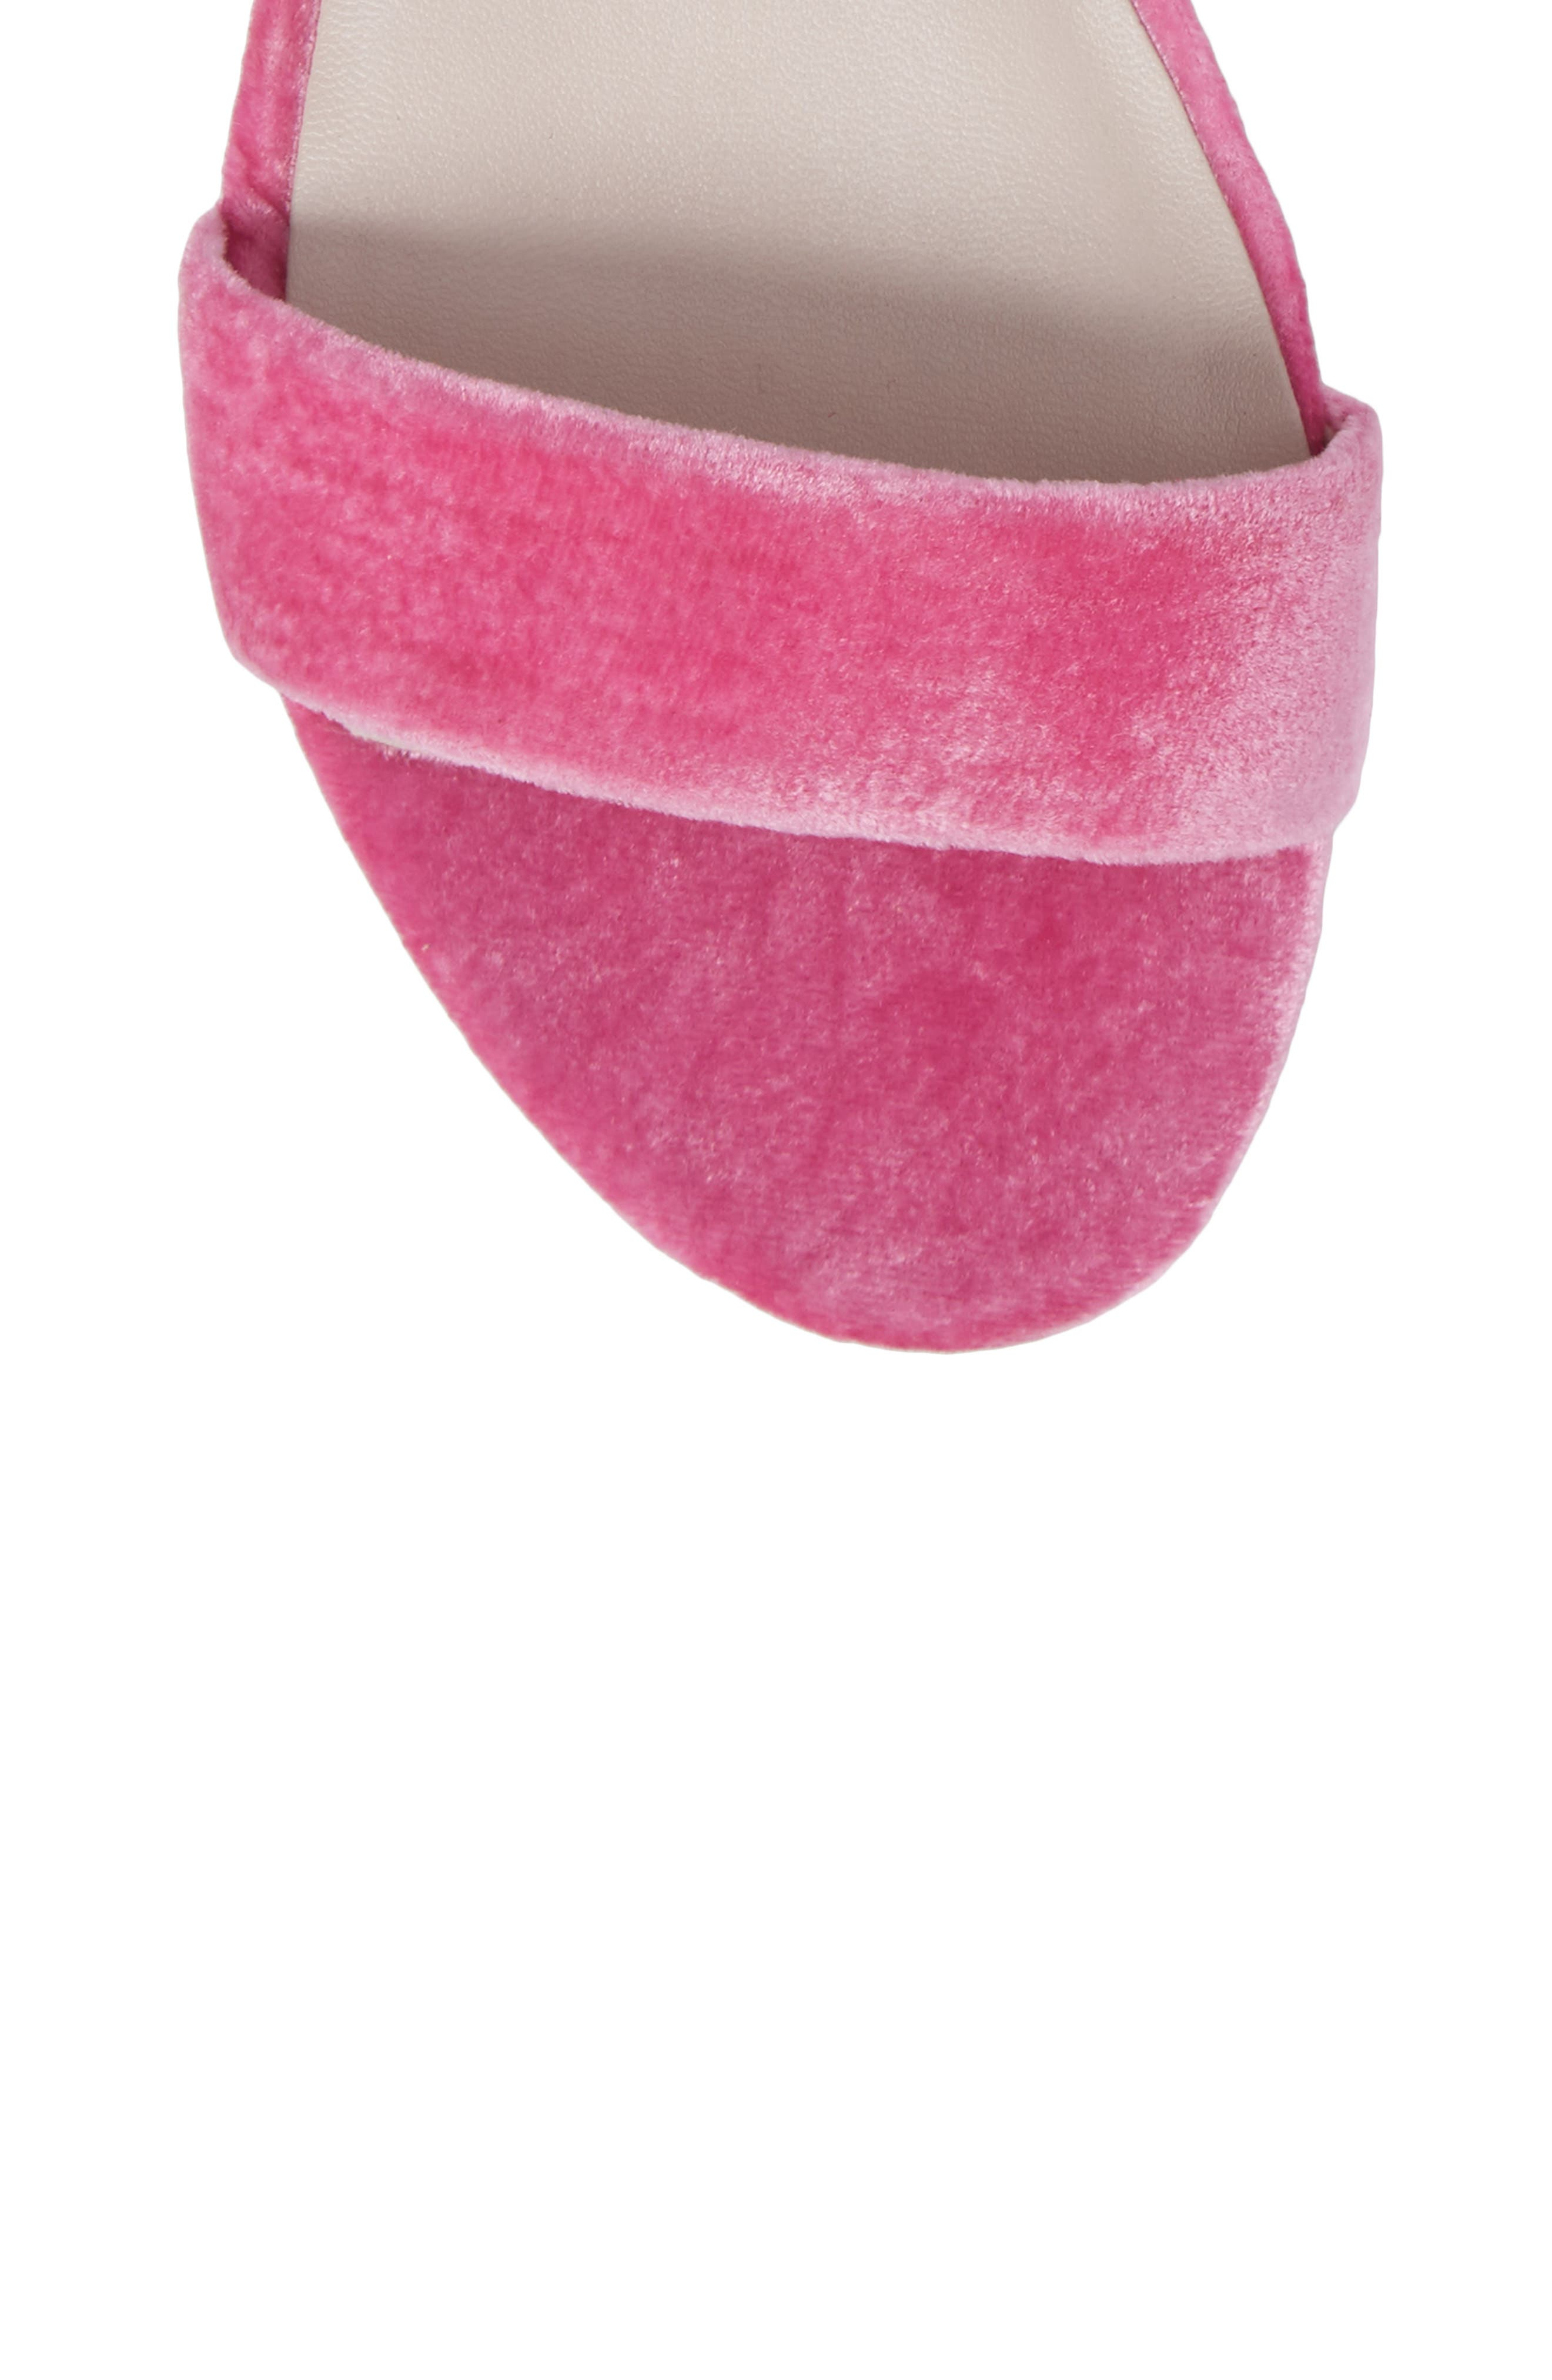 Valen Tassel Lace-Up Sandal,                             Alternate thumbnail 68, color,